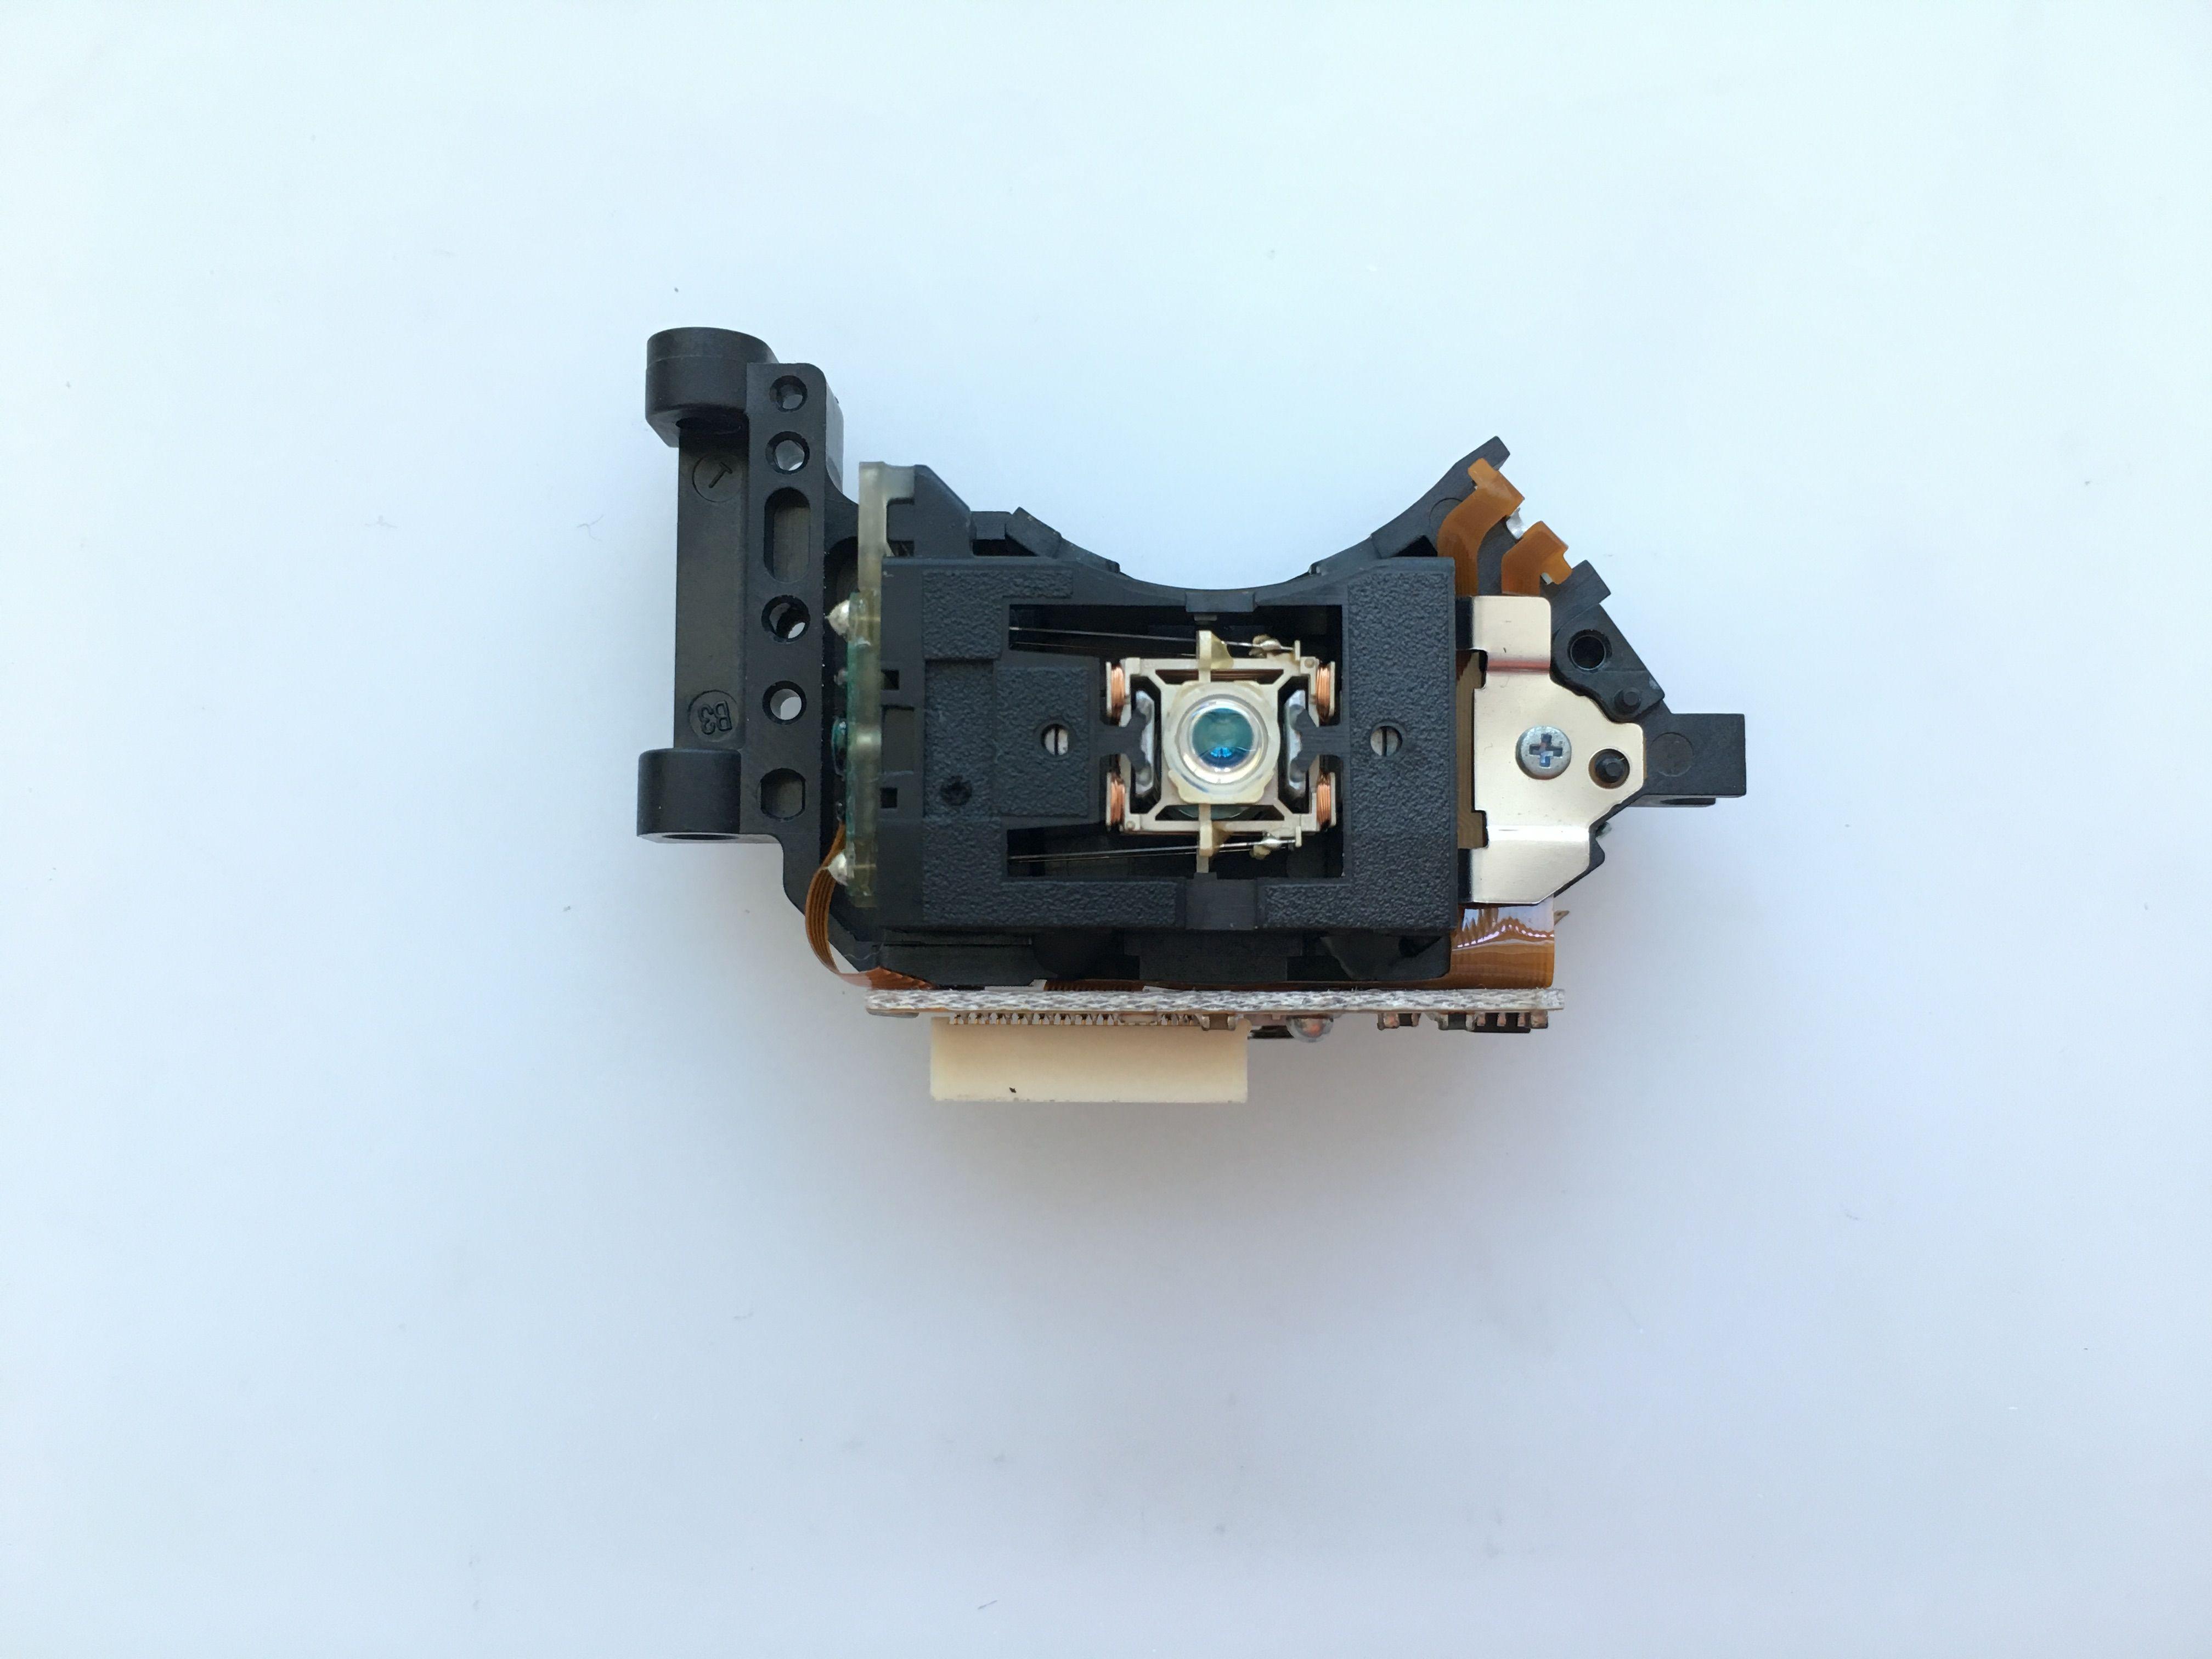 New Original Laser Lens SF-HD63 HD 63 for Xbox 360 DVD ROM Disc car Drive  TS-H943 GDR-3120L Replacement Repair Part Free Shipping